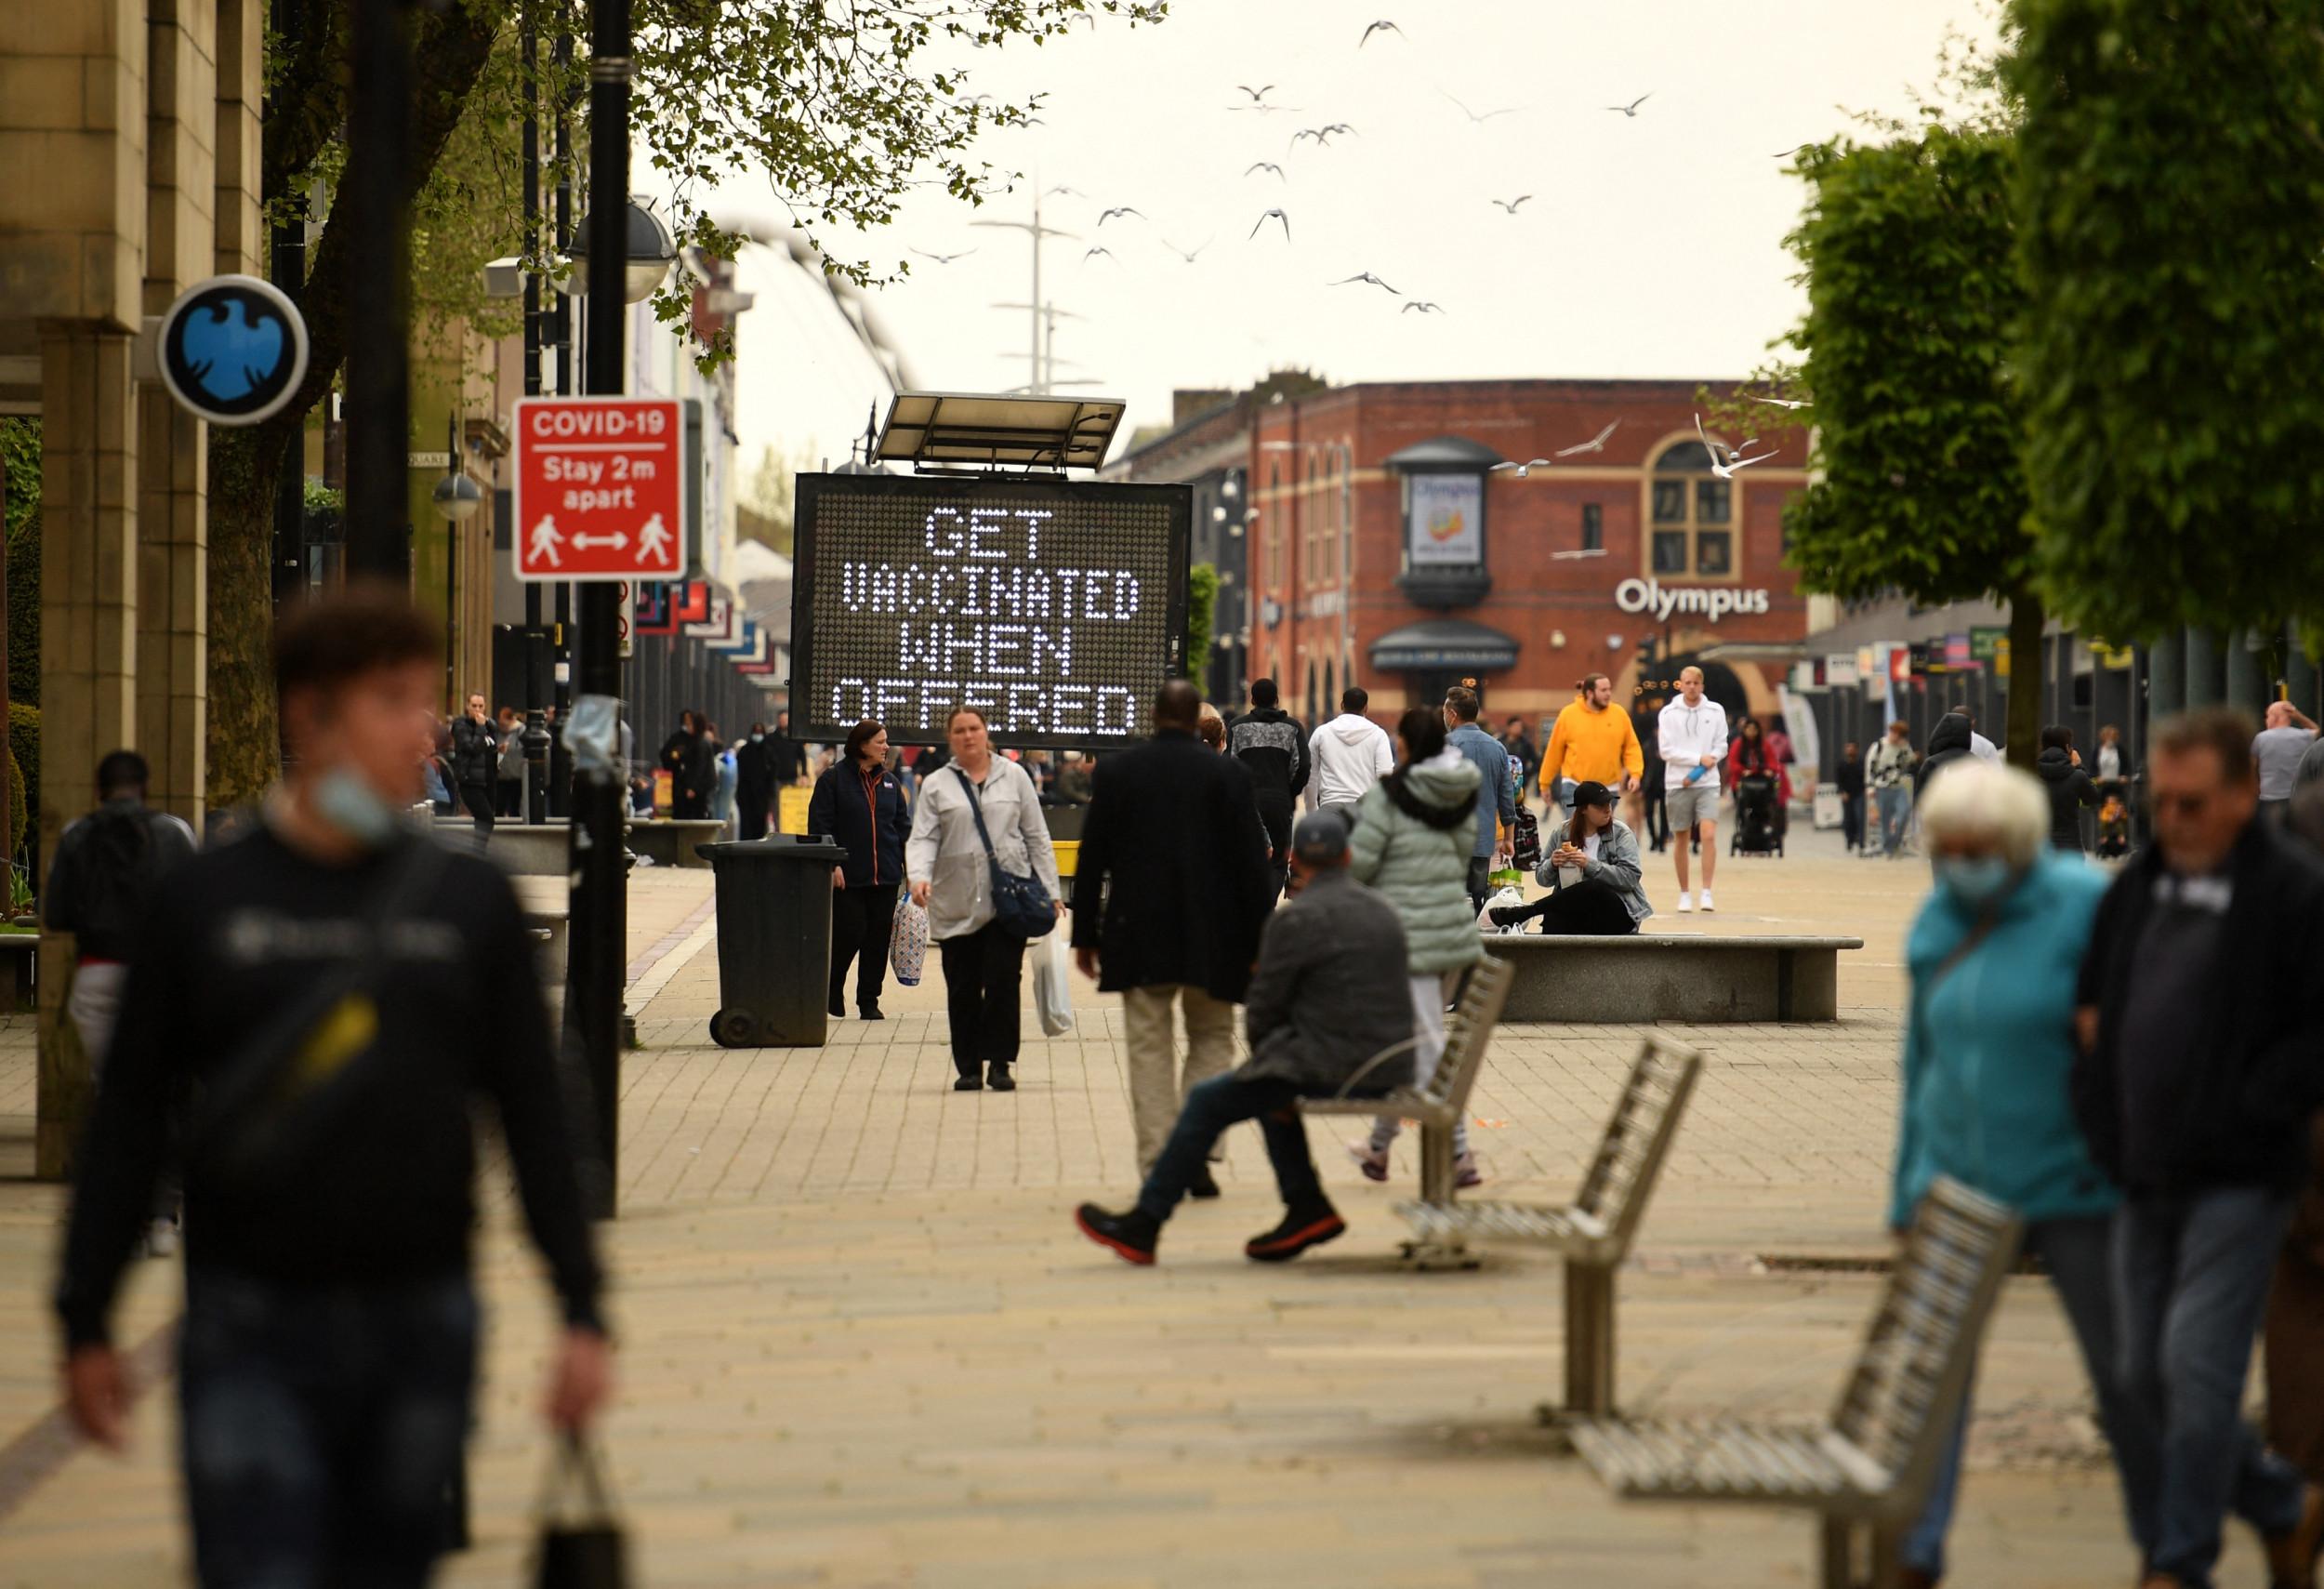 Britain's COVID-19 Cases Jump 24% In One Week, Stoke Fears of Variant Spread, Lockdown